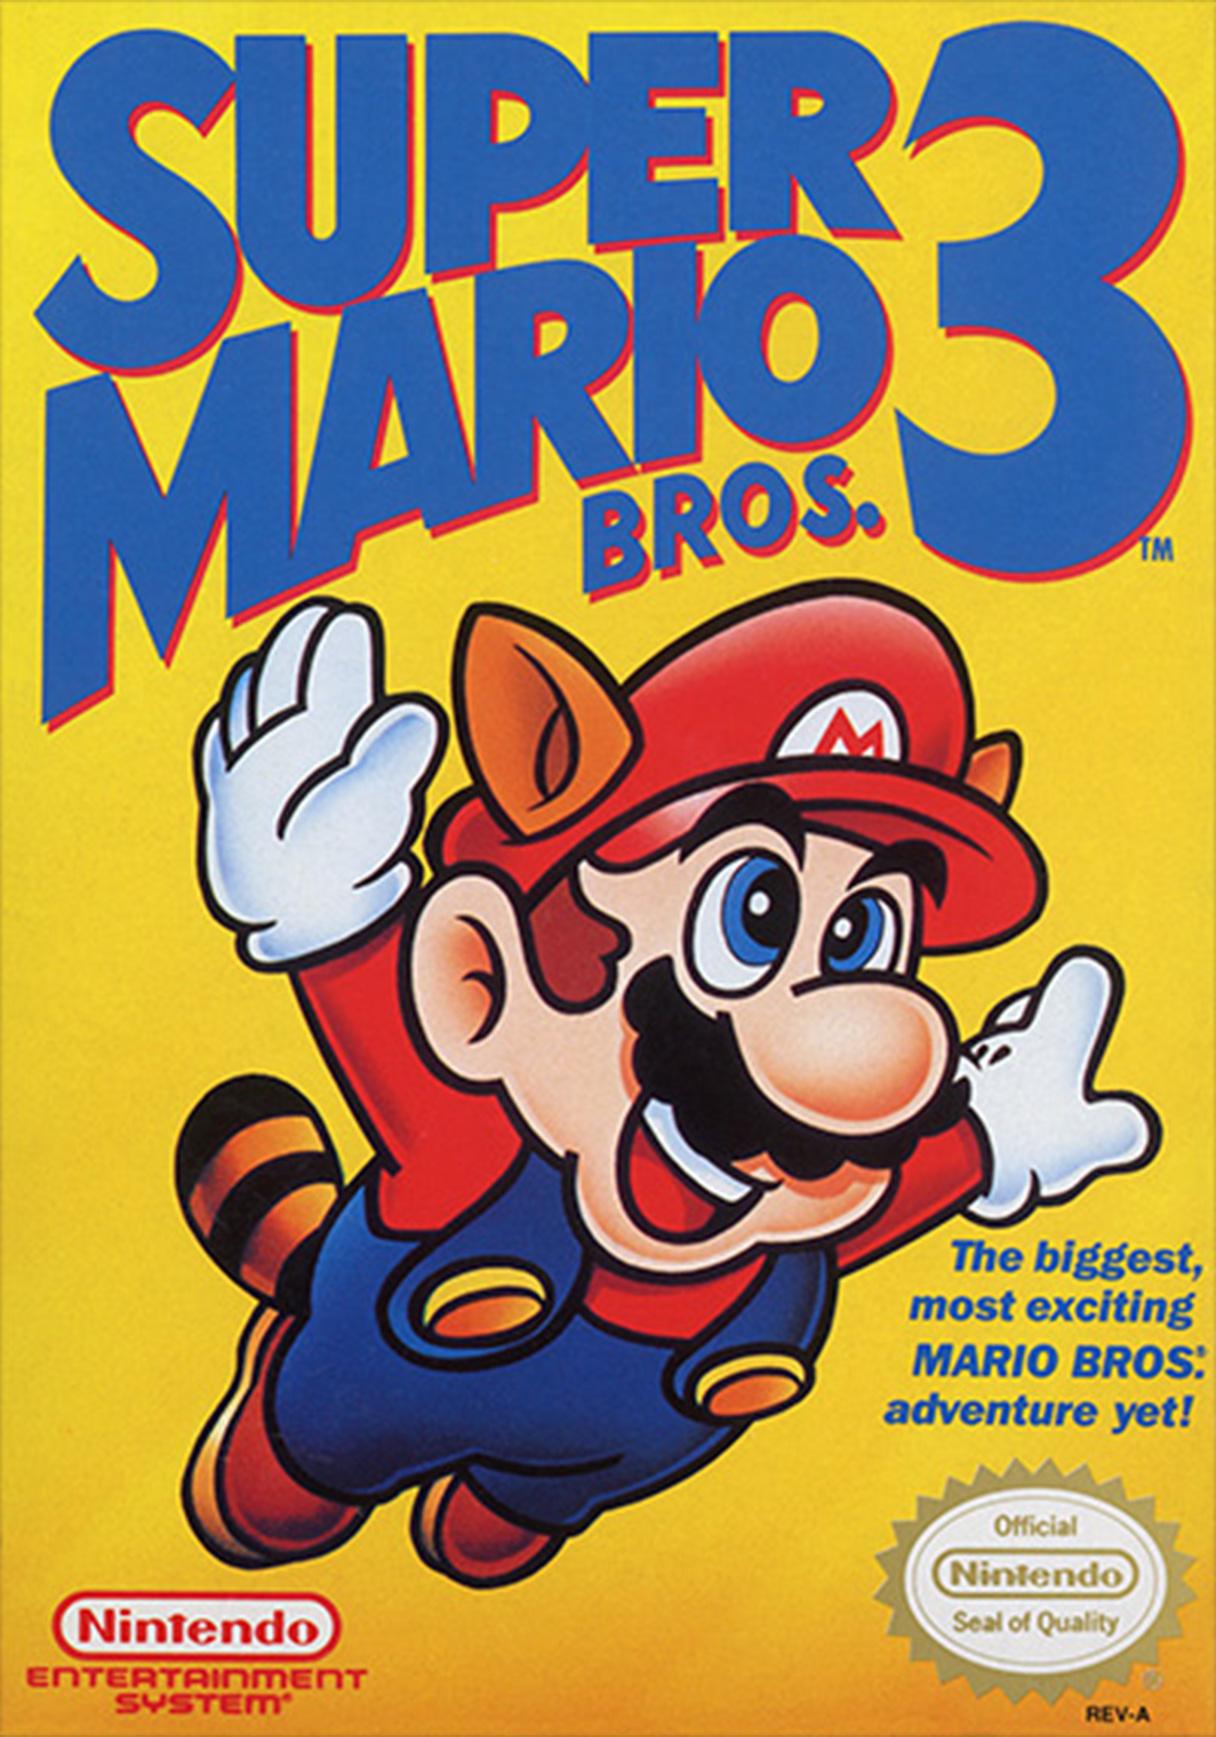 Nintendo Classic Mini Nes Special Interview  Volume 3 -5264